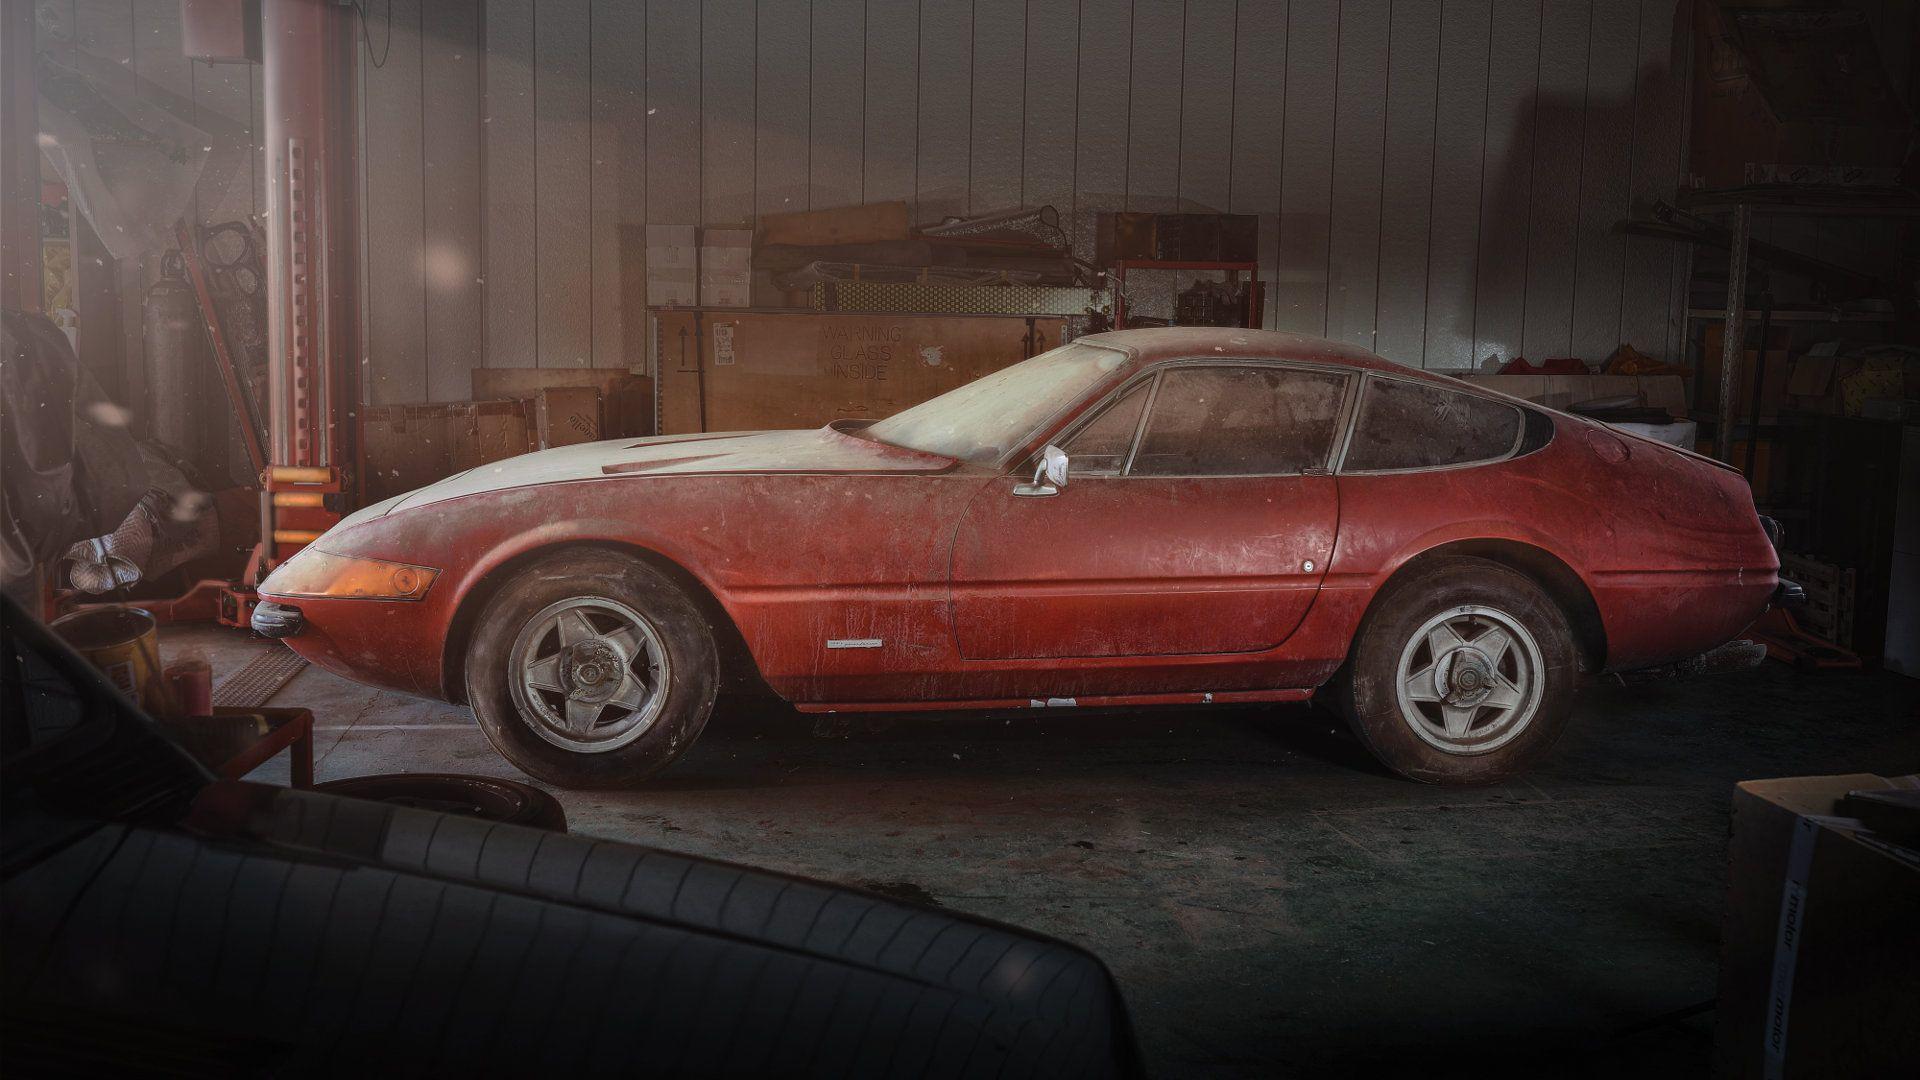 Ferrari Daytona Alloy Barn Find Brings 2 1m At Auction